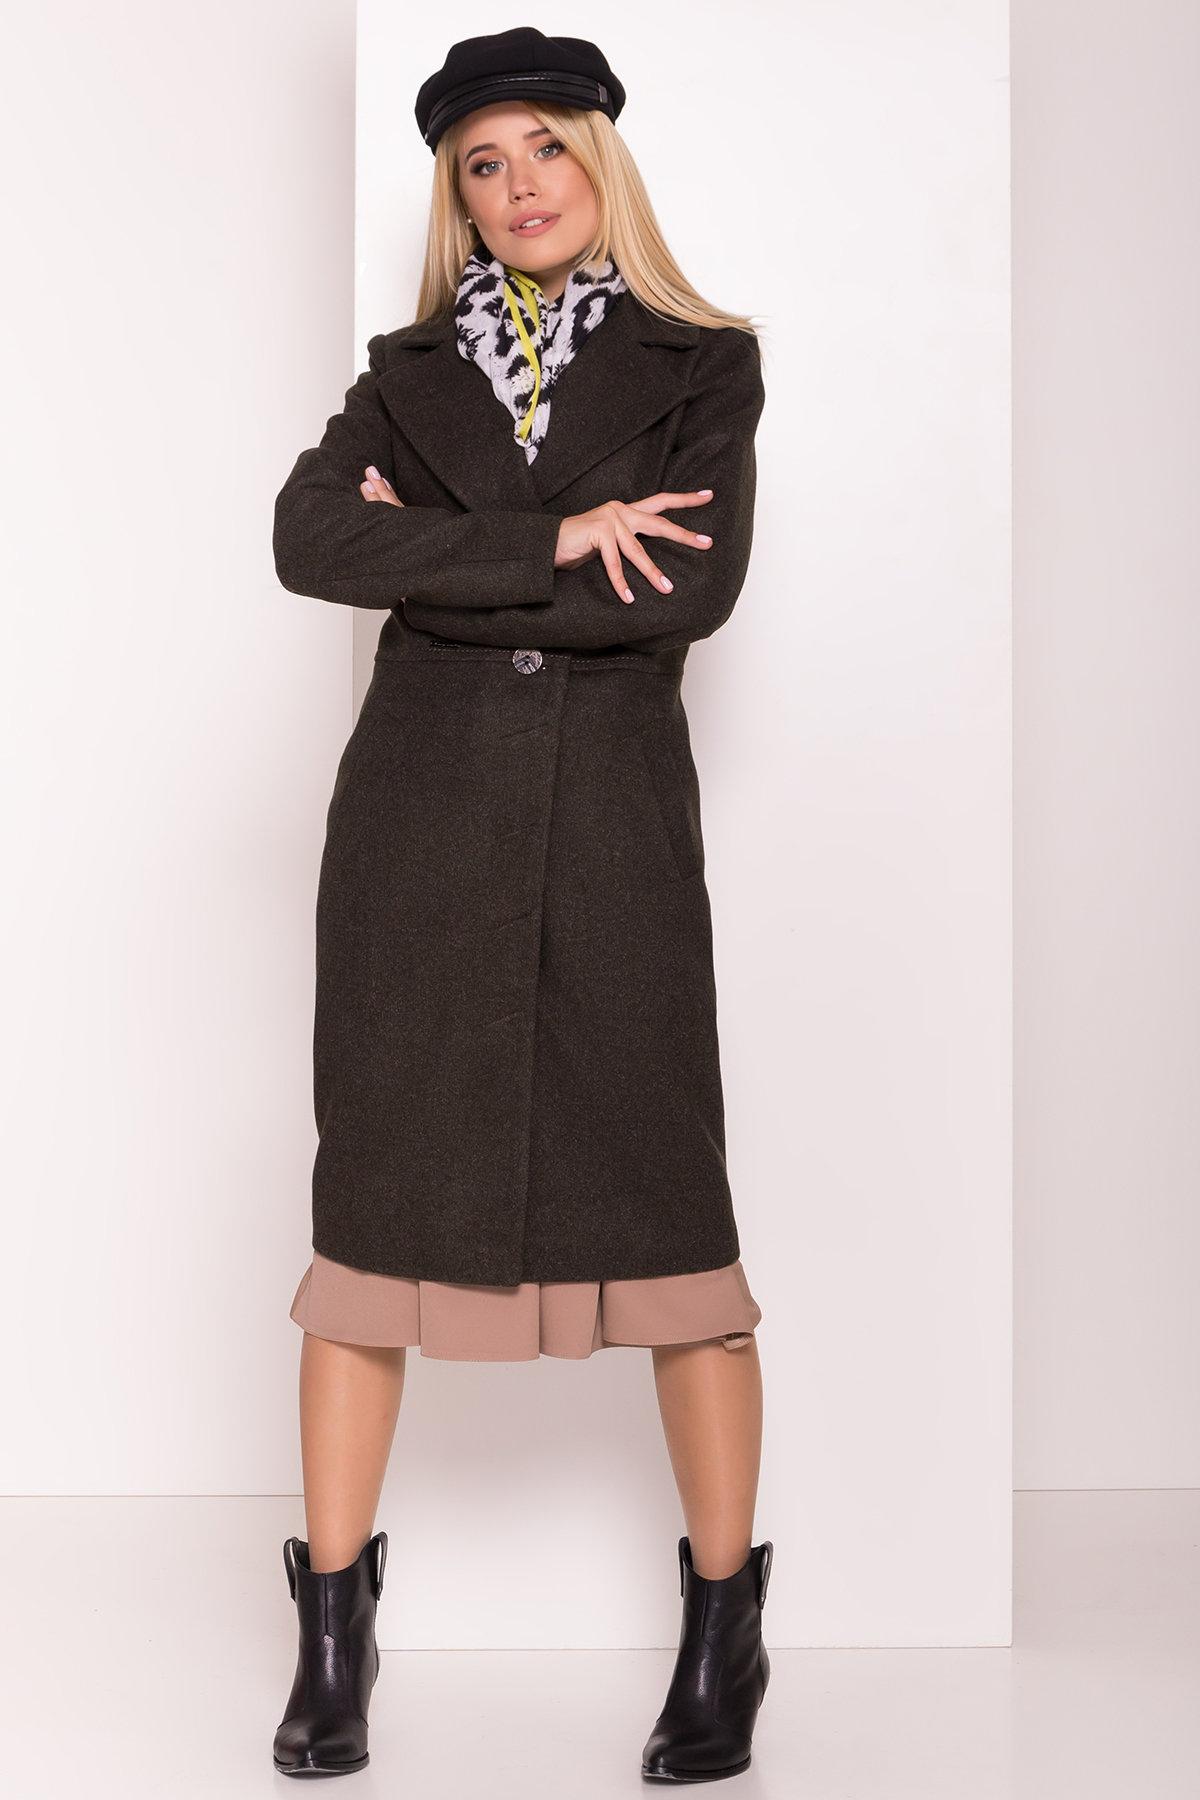 Пальто Габриэлла 7876 АРТ. 43820 Цвет: Хаки 16 - фото 4, интернет магазин tm-modus.ru